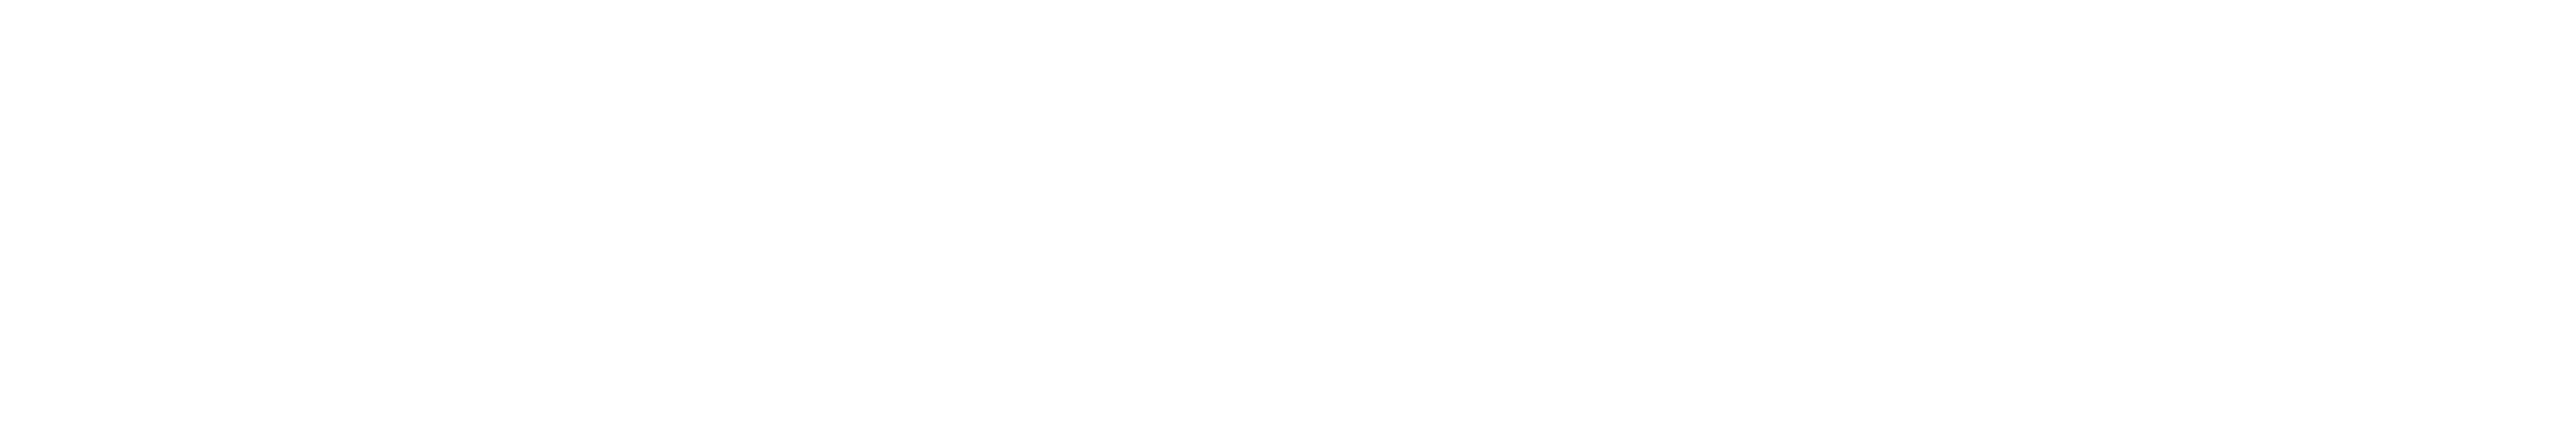 RDX Extendable Ground Screws